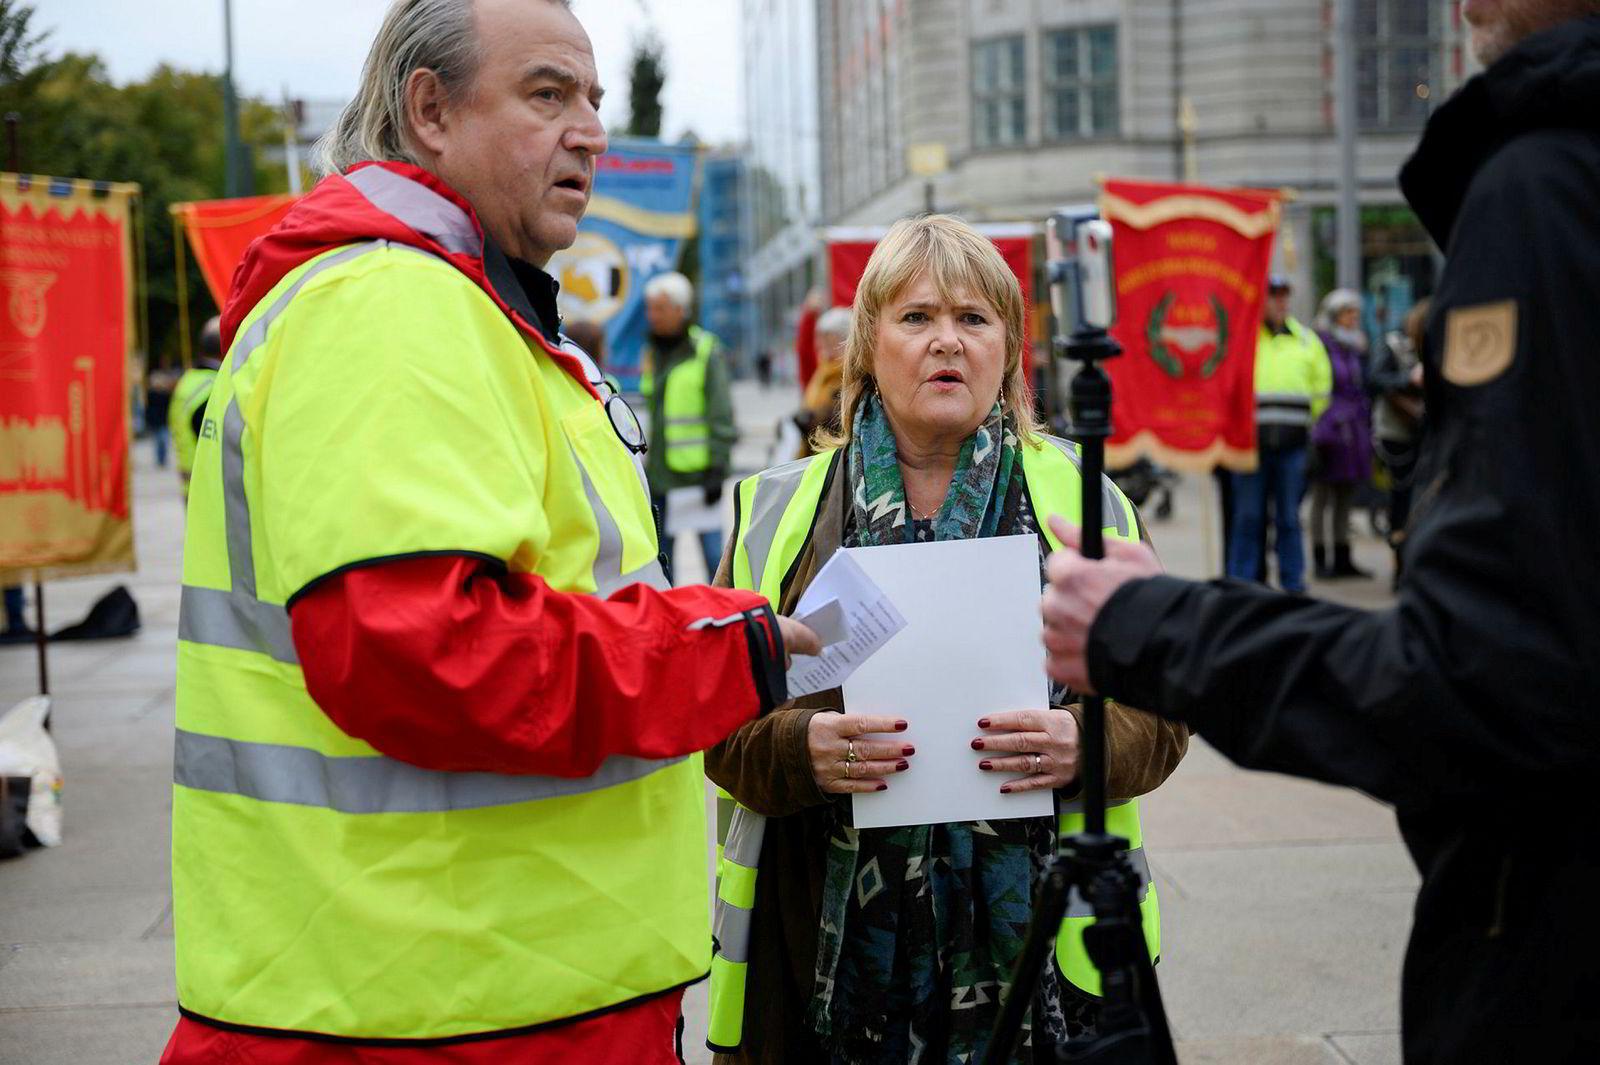 Lederne Rolf Ringdal, i Norsk Lokomotivmannsforbund og Jane B. Sæthre, i Norsk Jernbaneforbund ledet politisk streik mot innføring av EUs 4. jernbanedirektiv torsdag.